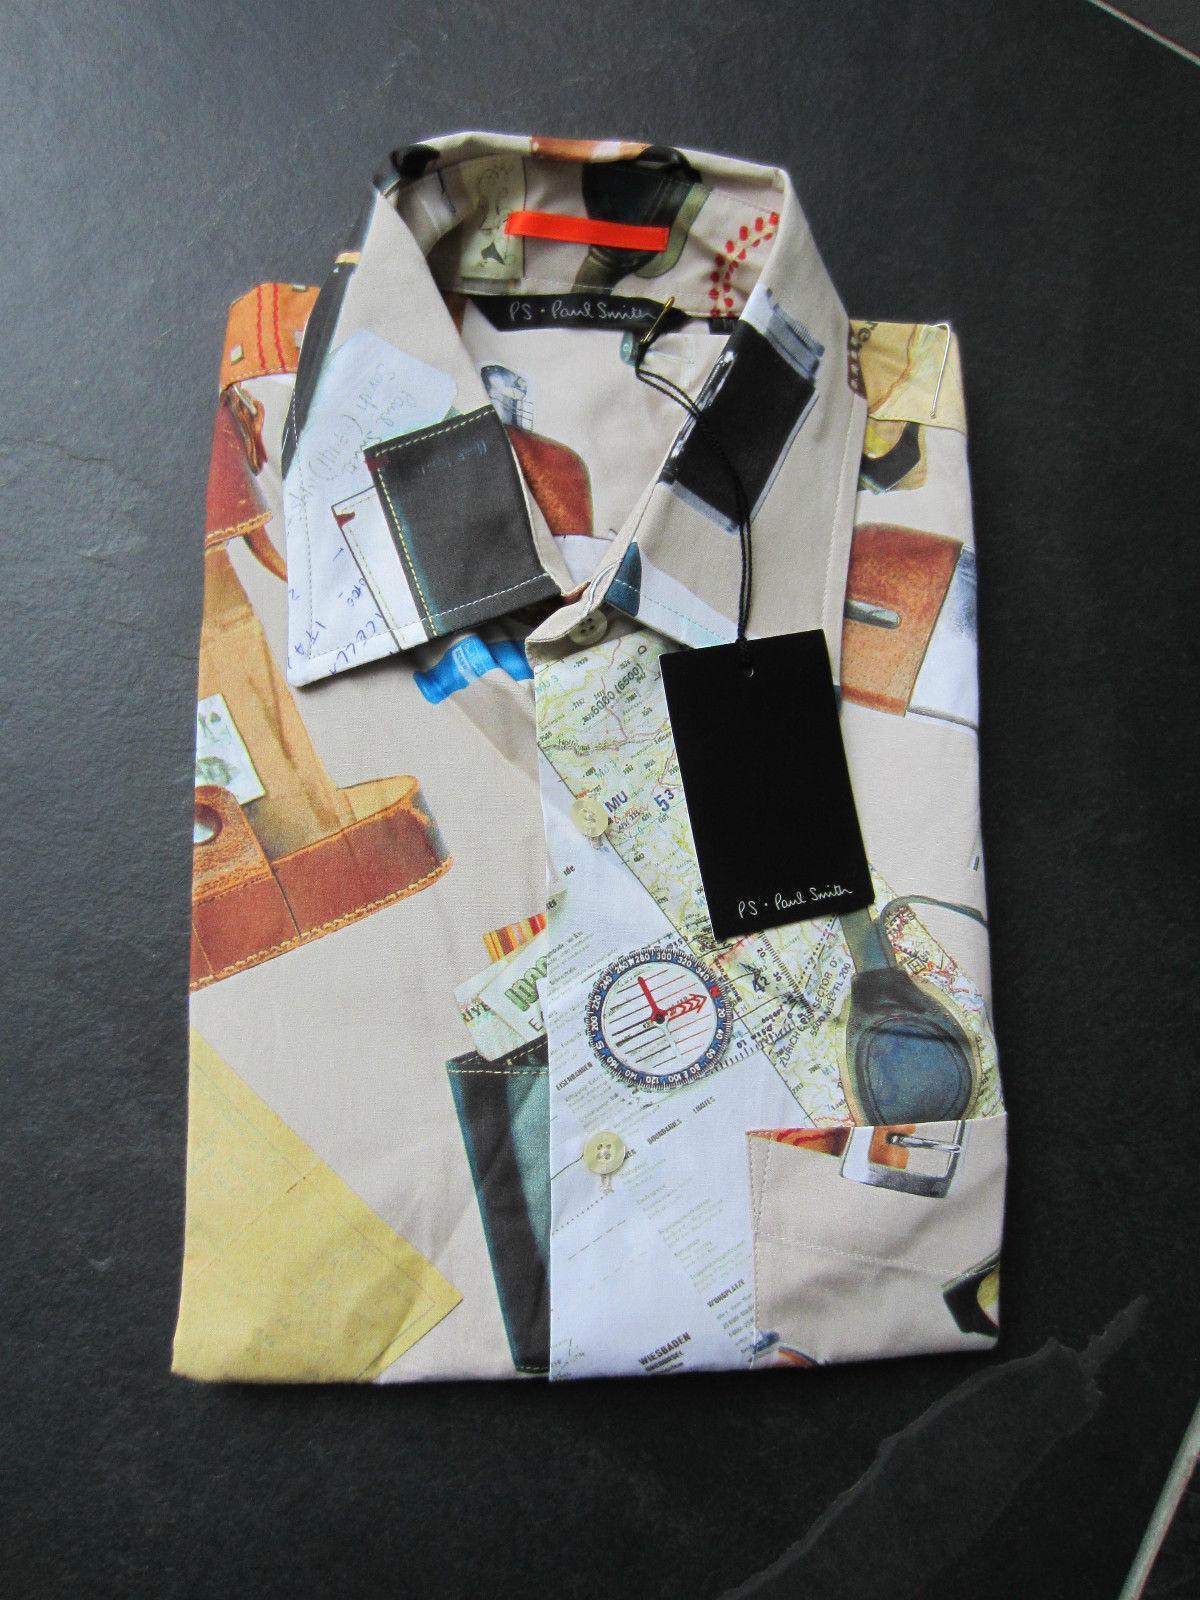 Paul Smith   PS   kurzärmlig   Reise Karte   Hemd   | Feine Verarbeitung